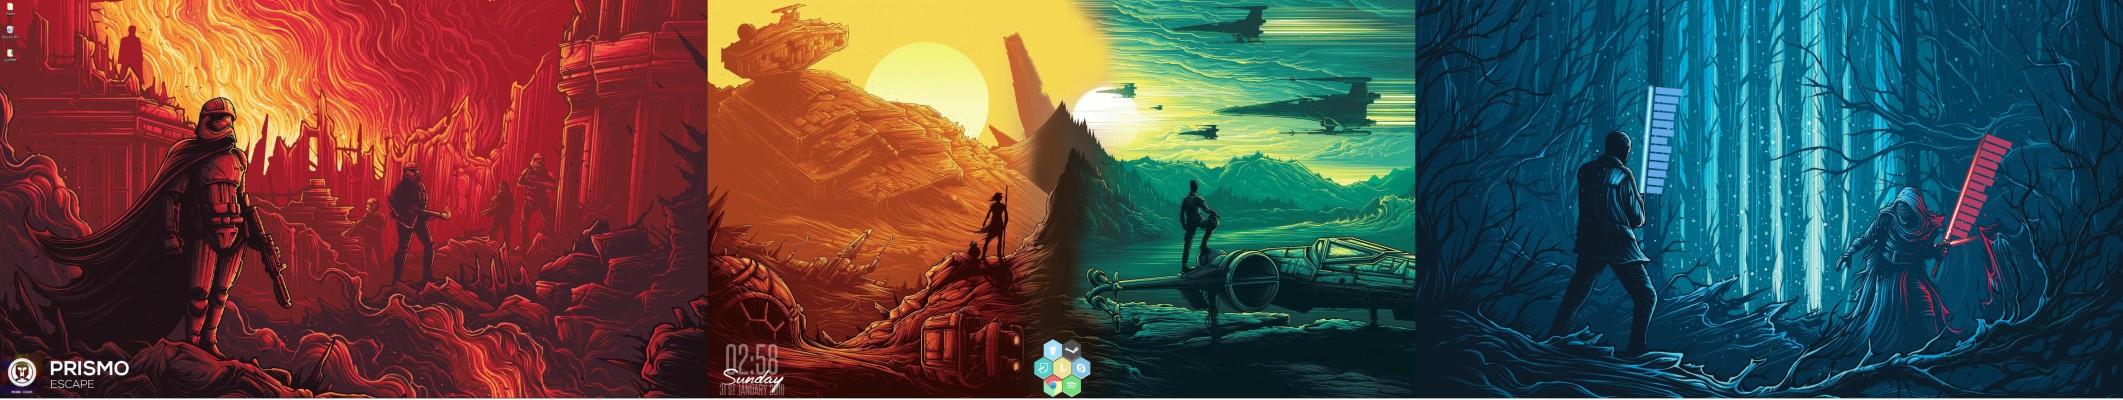 4k Triple Monitor Background 5760x1080 Wallpaper Teahub Io